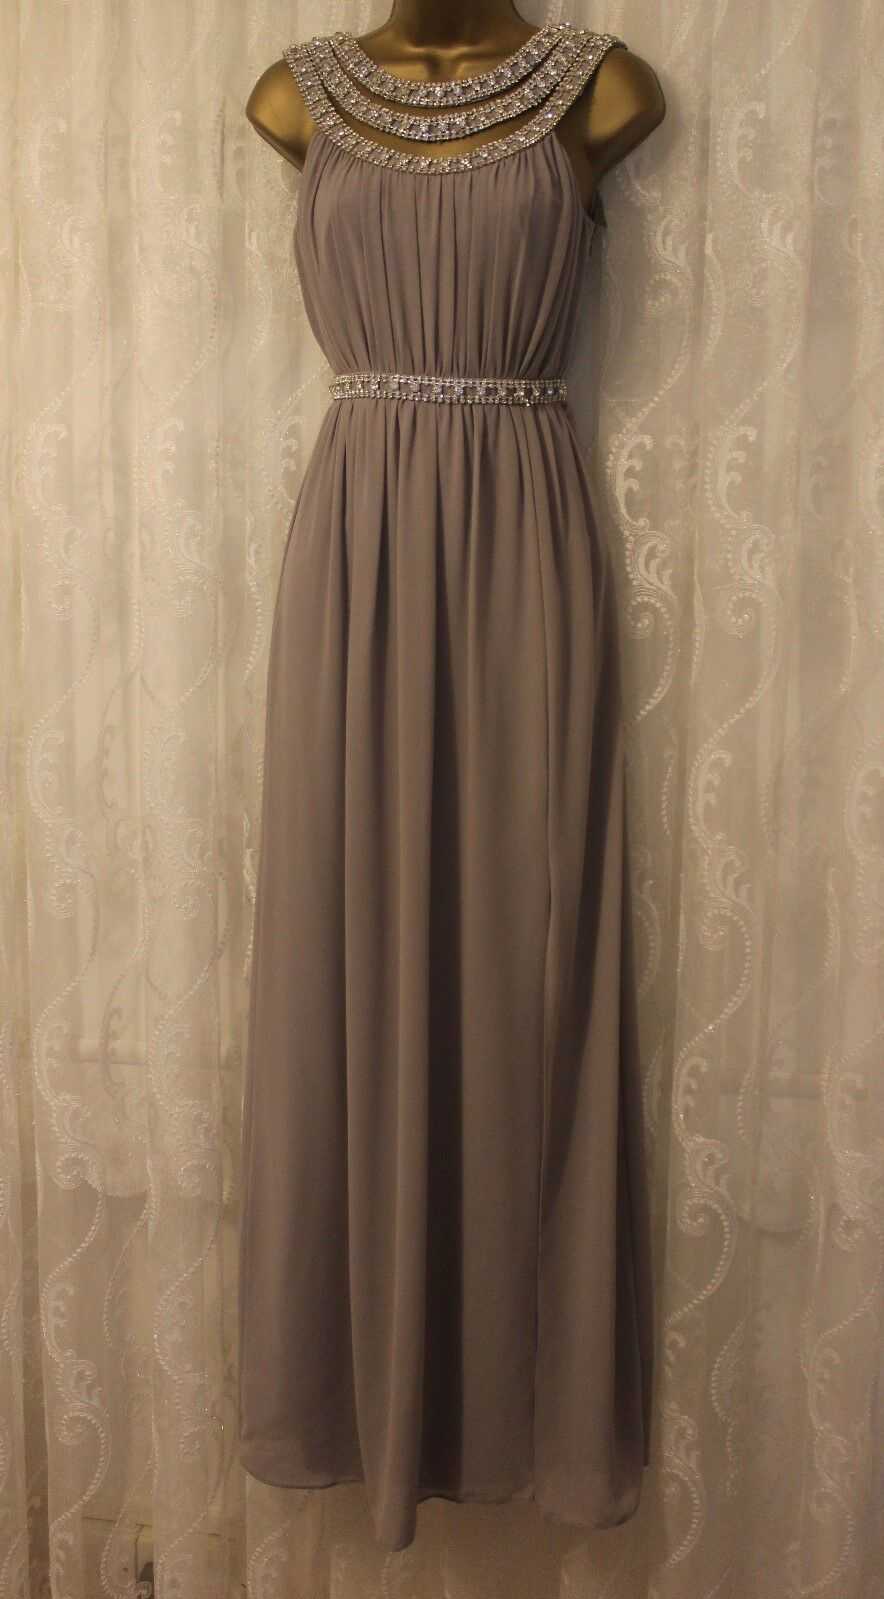 TFNC Wedding Diamante Embellished Straps Bridal Maxi Bridesmaid Party Dress 6 34